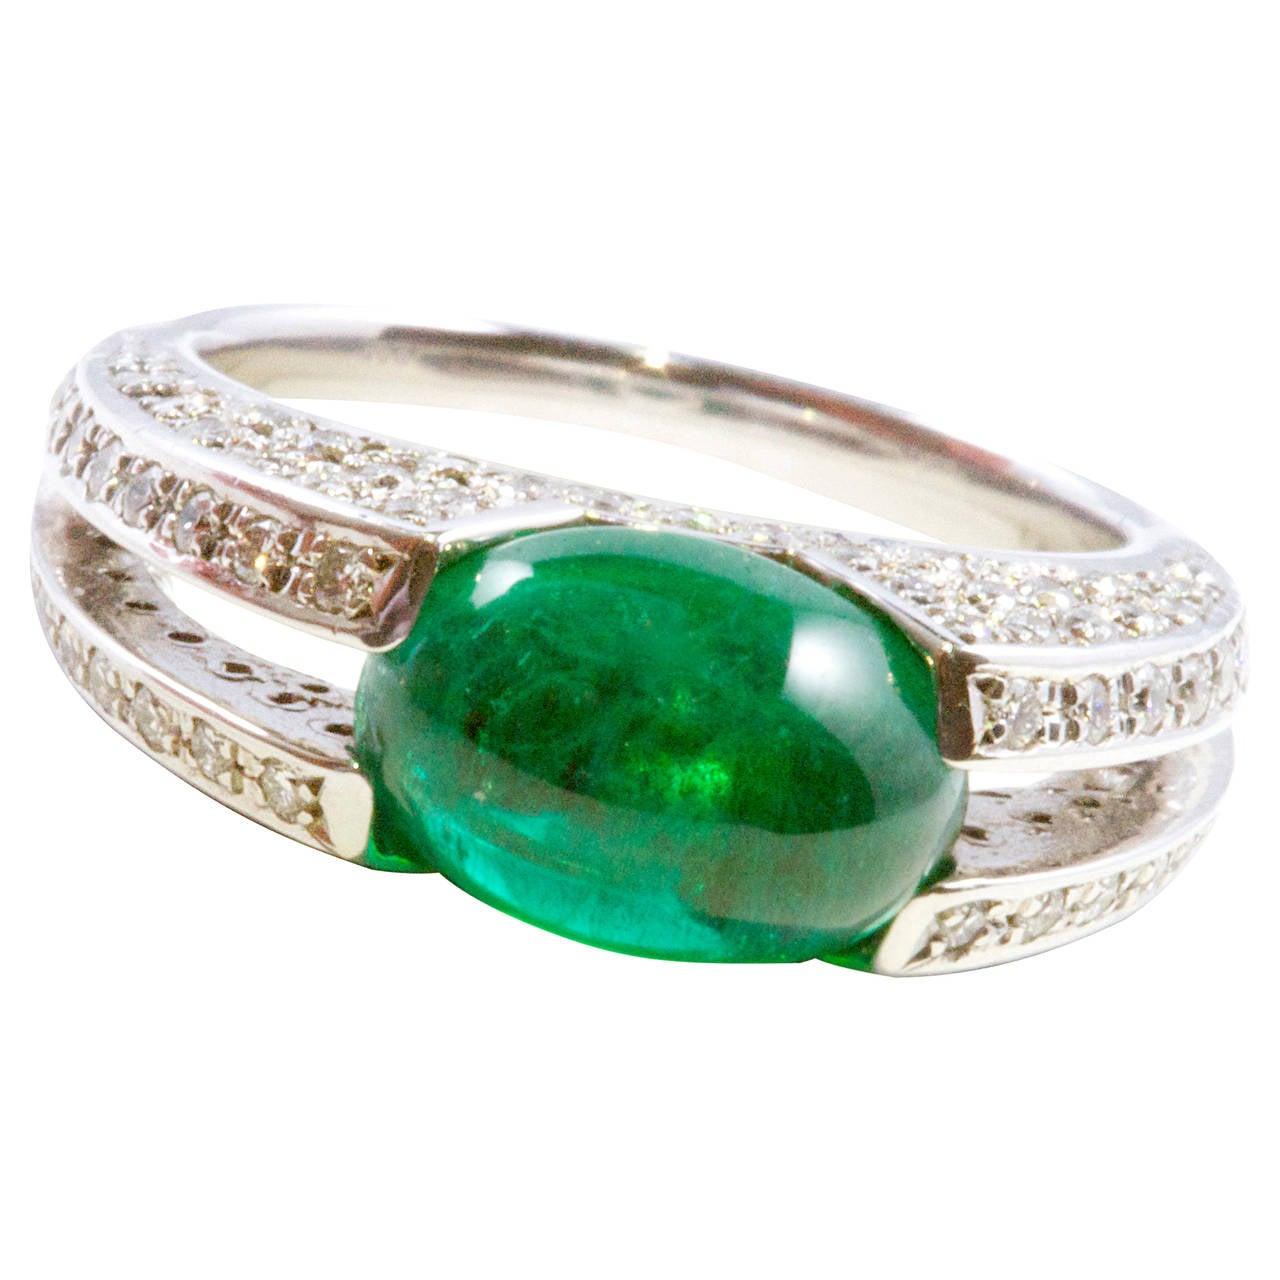 3 35 carat emerald platinum ring at 1stdibs